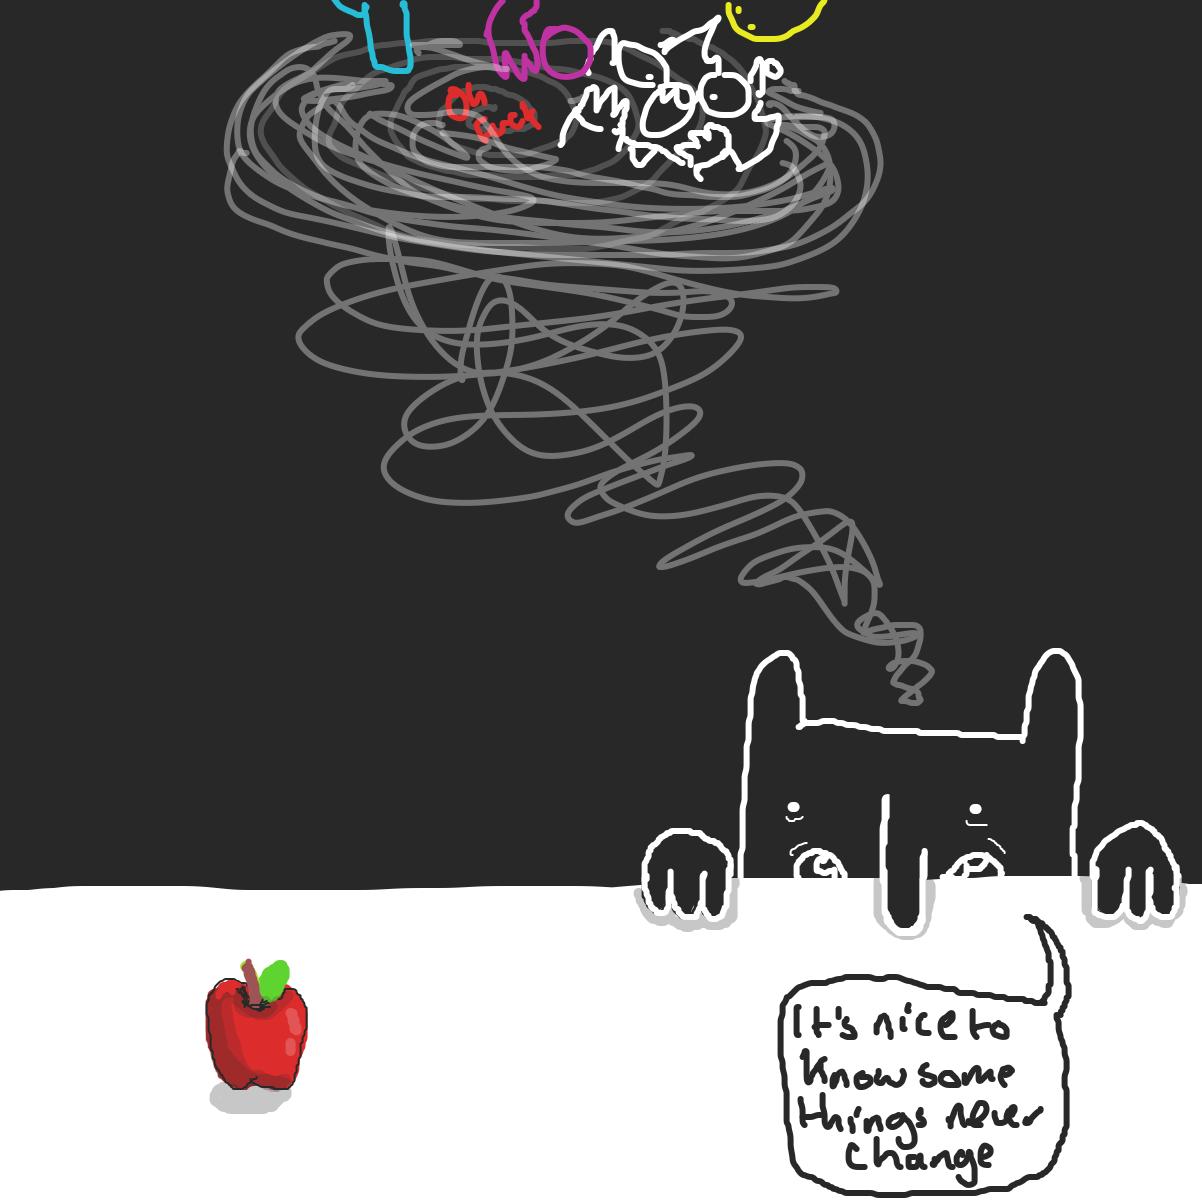 Drawing in Test by joshyouart